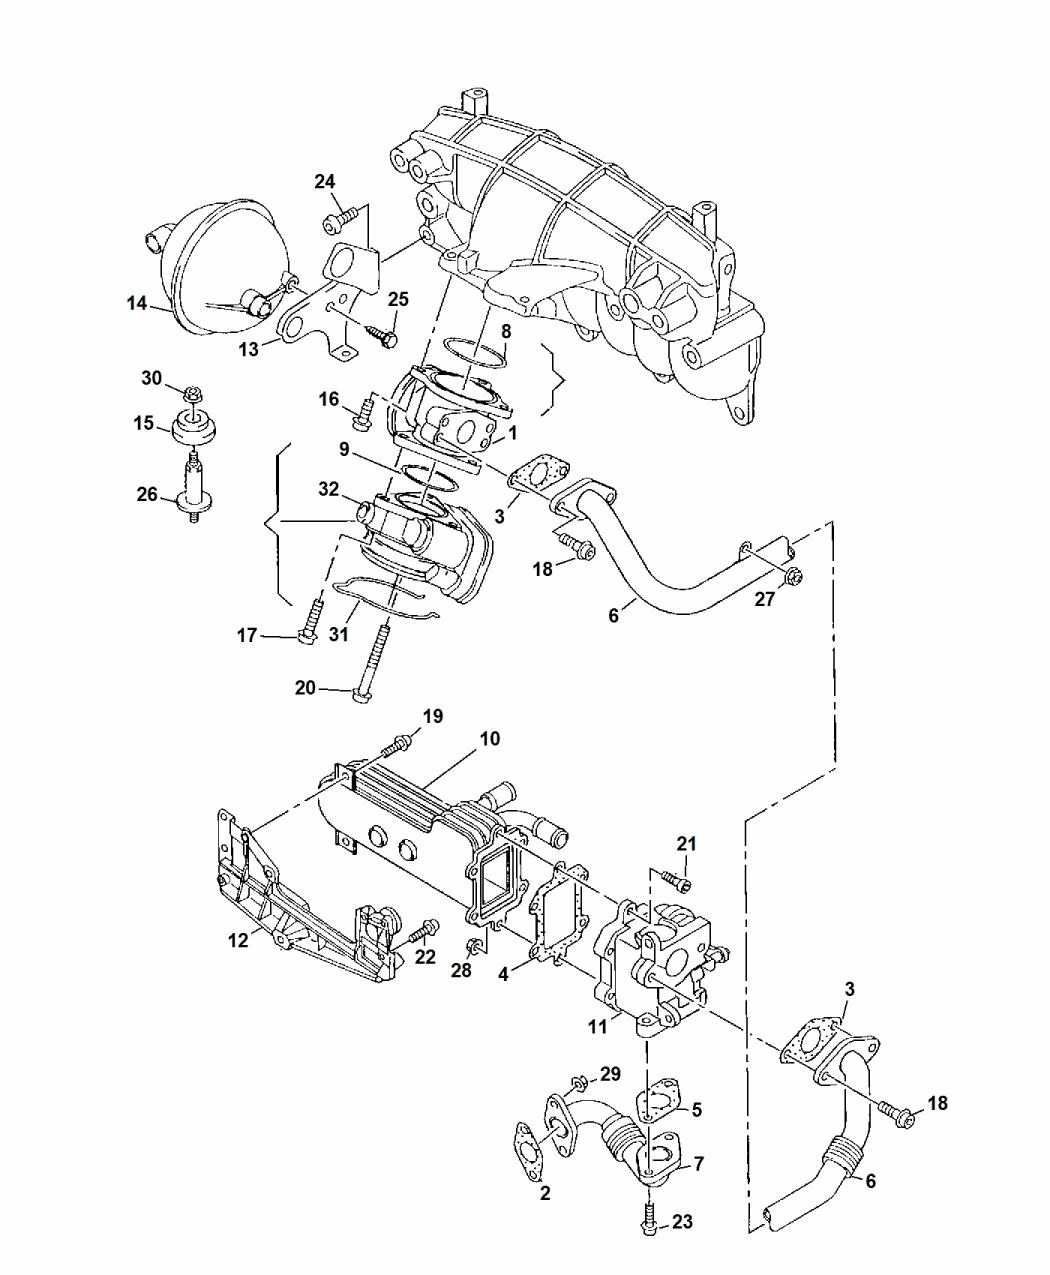 DX_7499] 2008 Dodge Caliber Engine Diagram Free DiagramSarc Amenti Phot Oliti Pap Mohammedshrine Librar Wiring 101